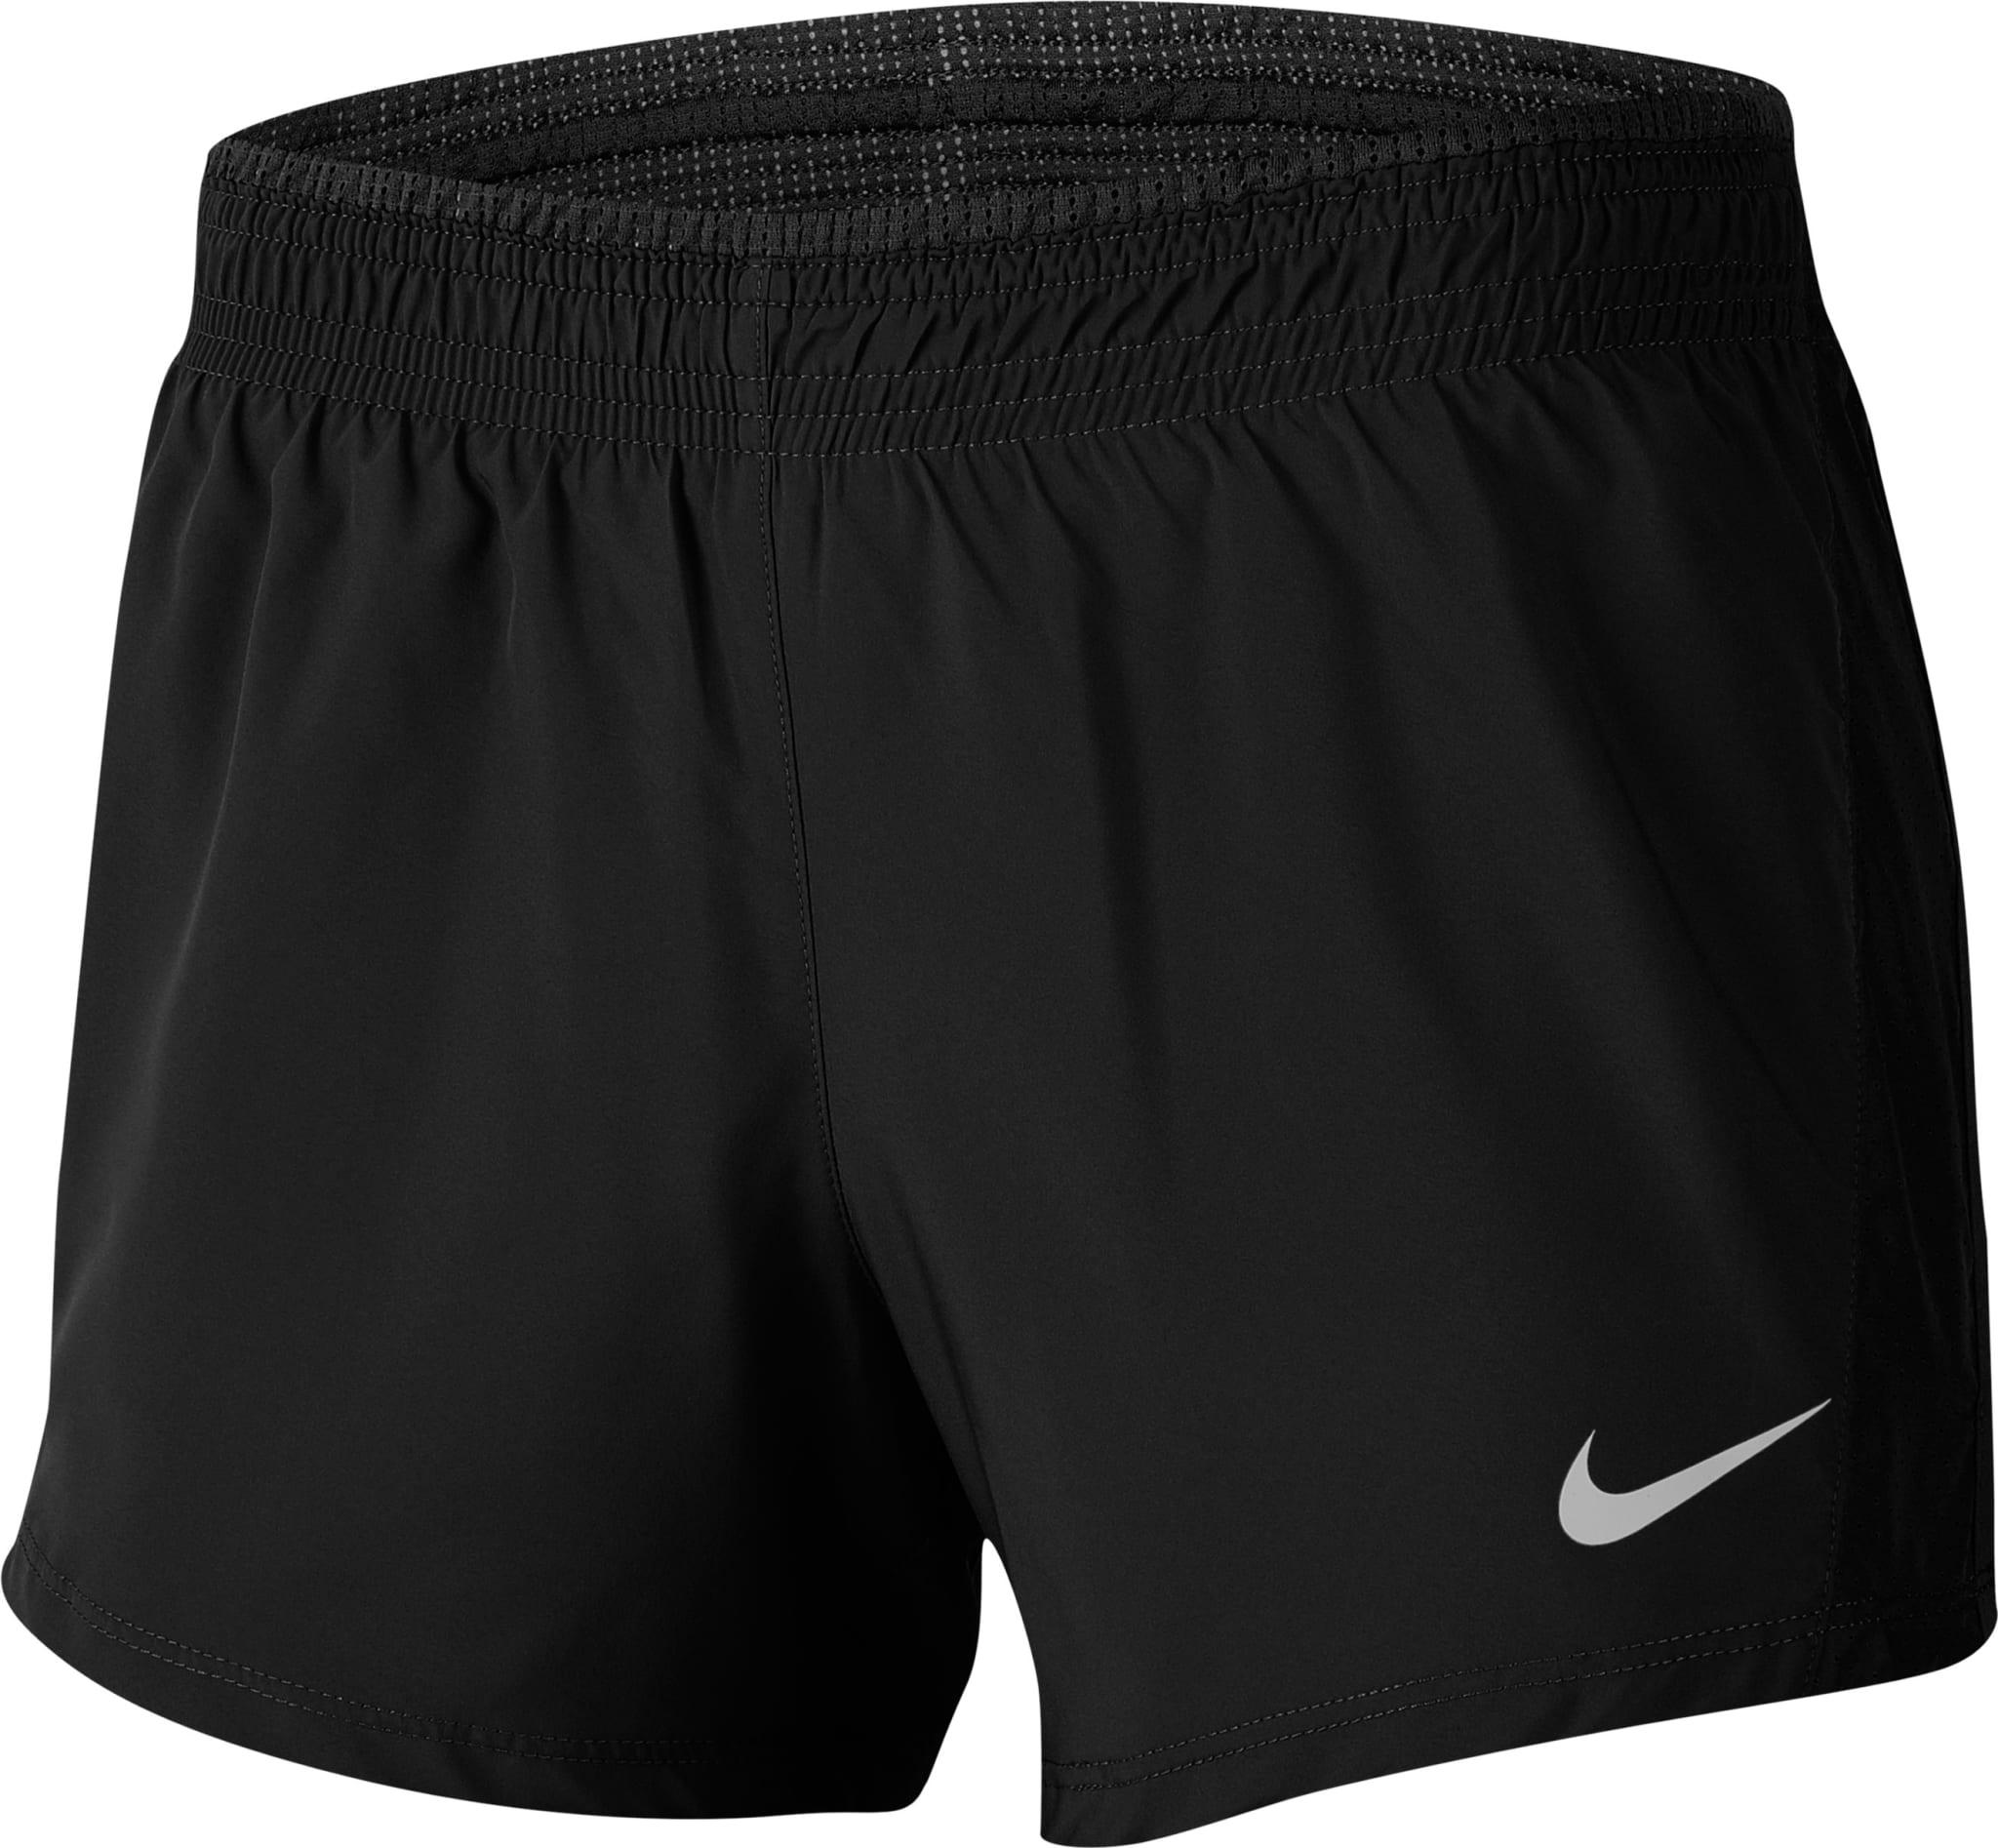 2-In-1 Running Shorts W